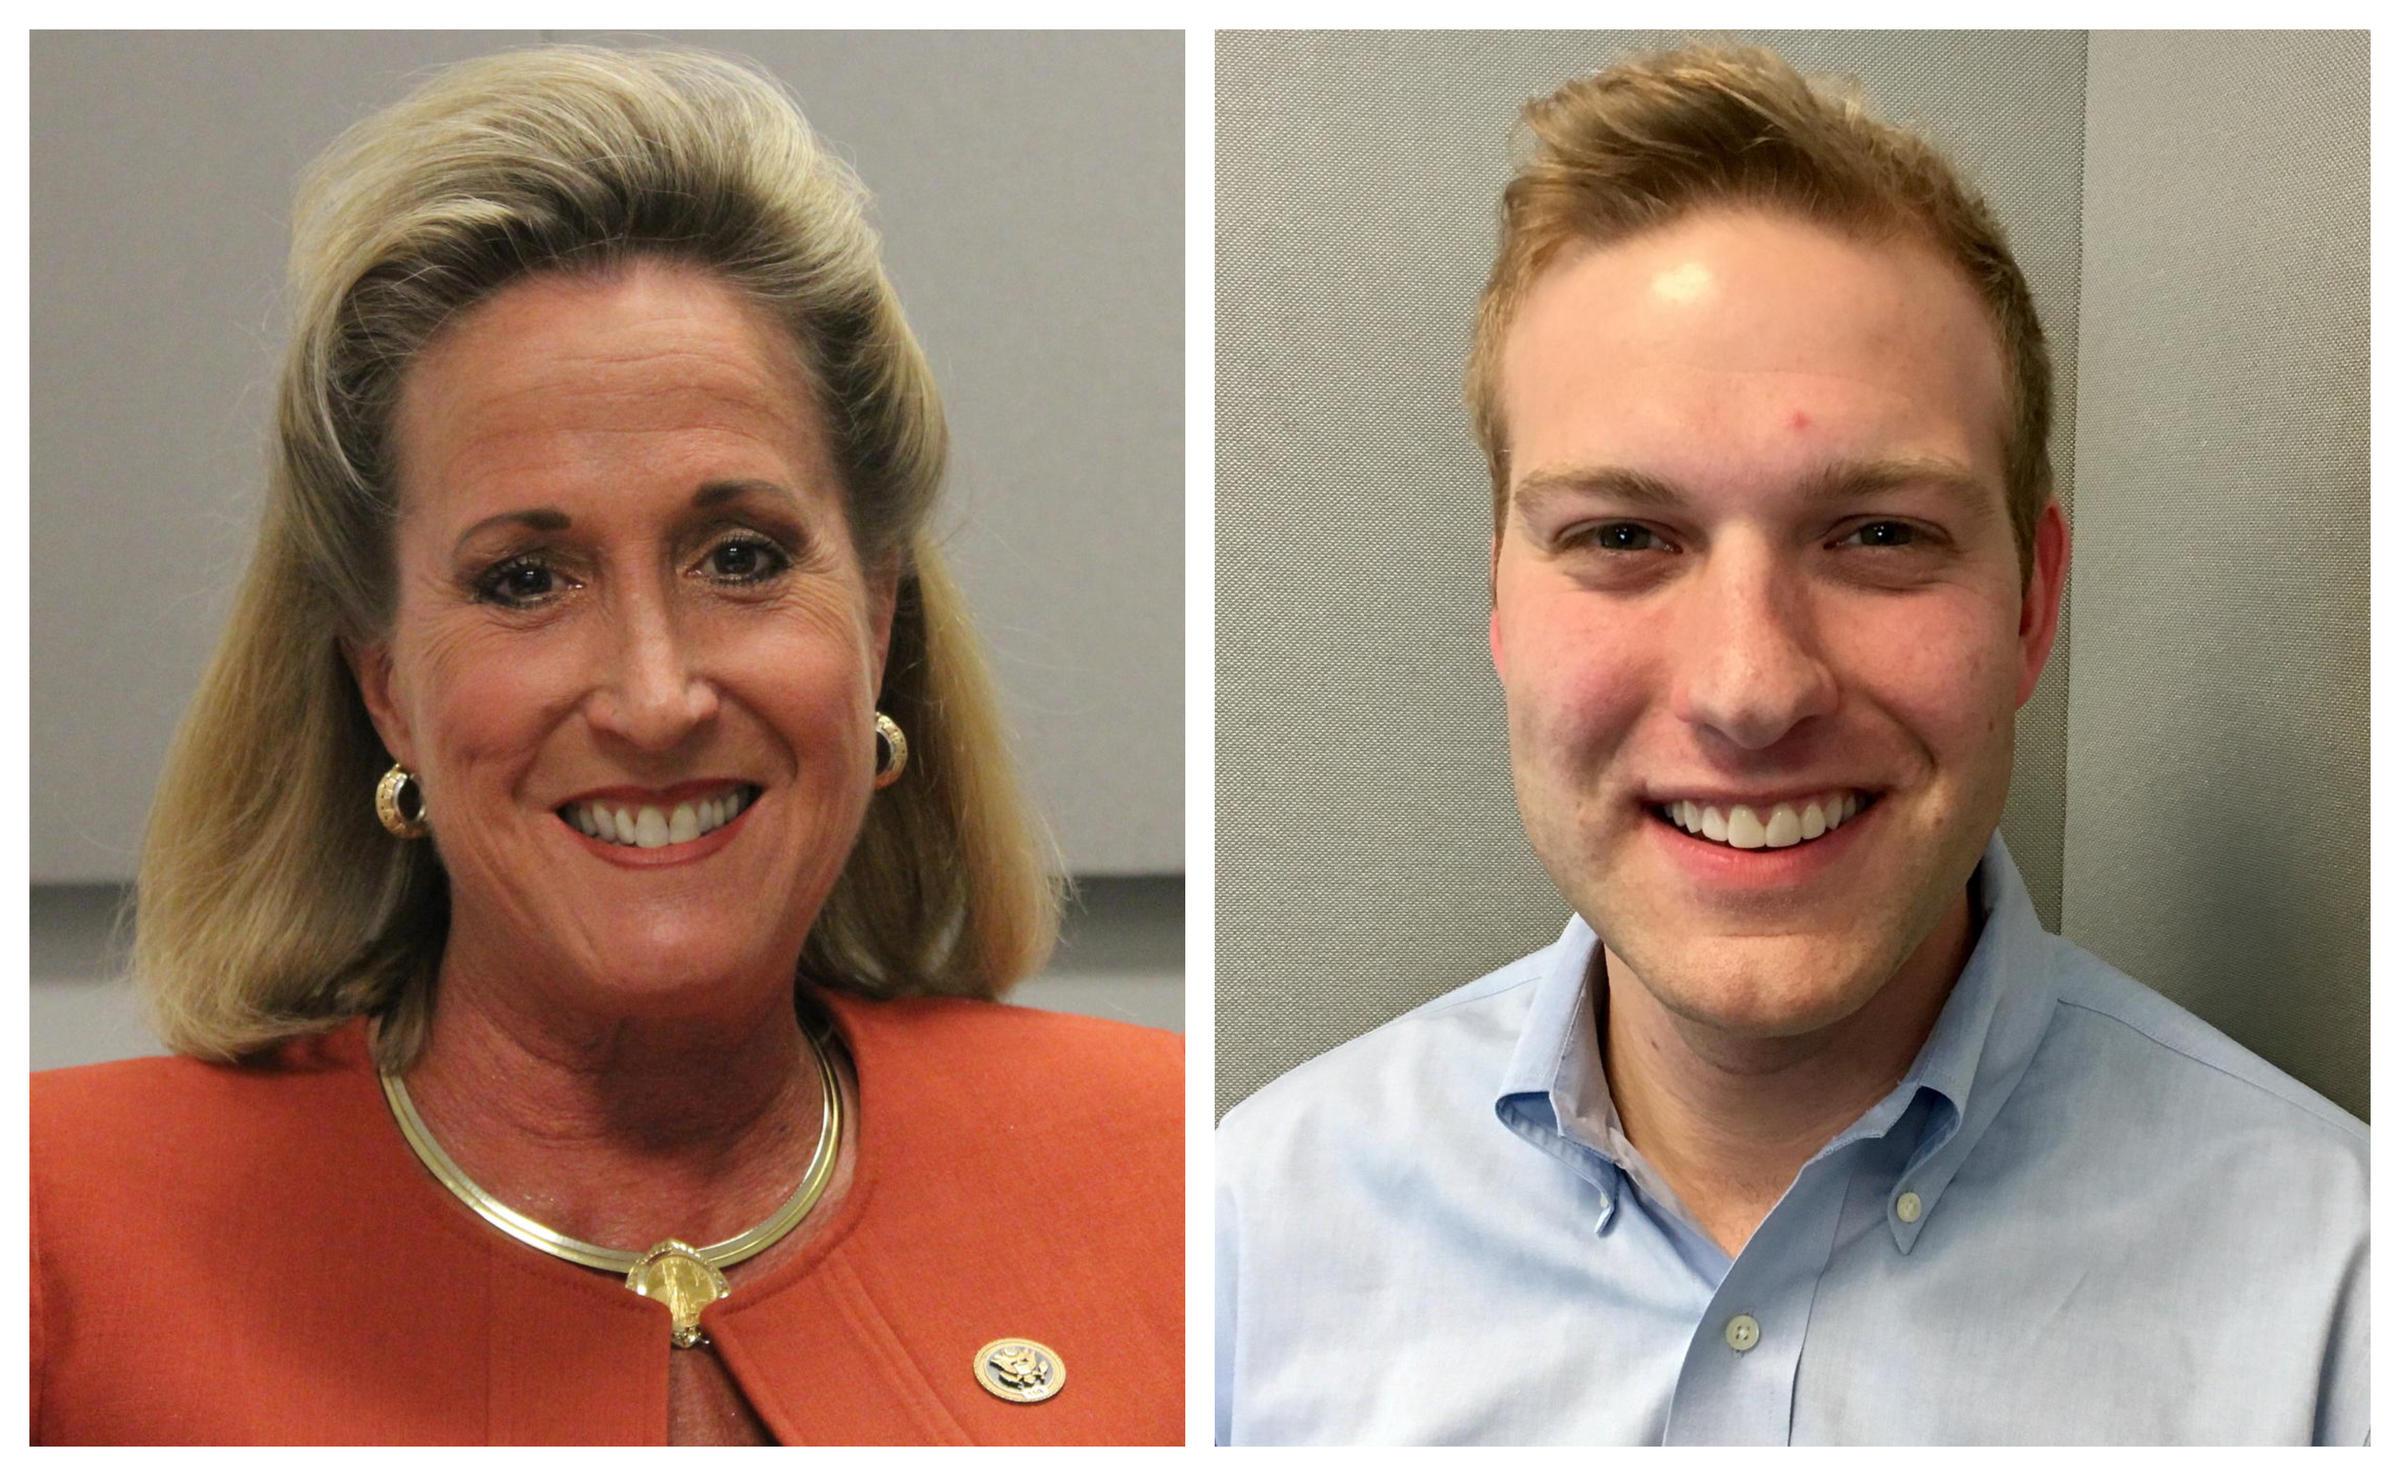 U S Rep Ann Wagner R Ballwin Faces Democratic Challenger Cort Vanostran In The November Election